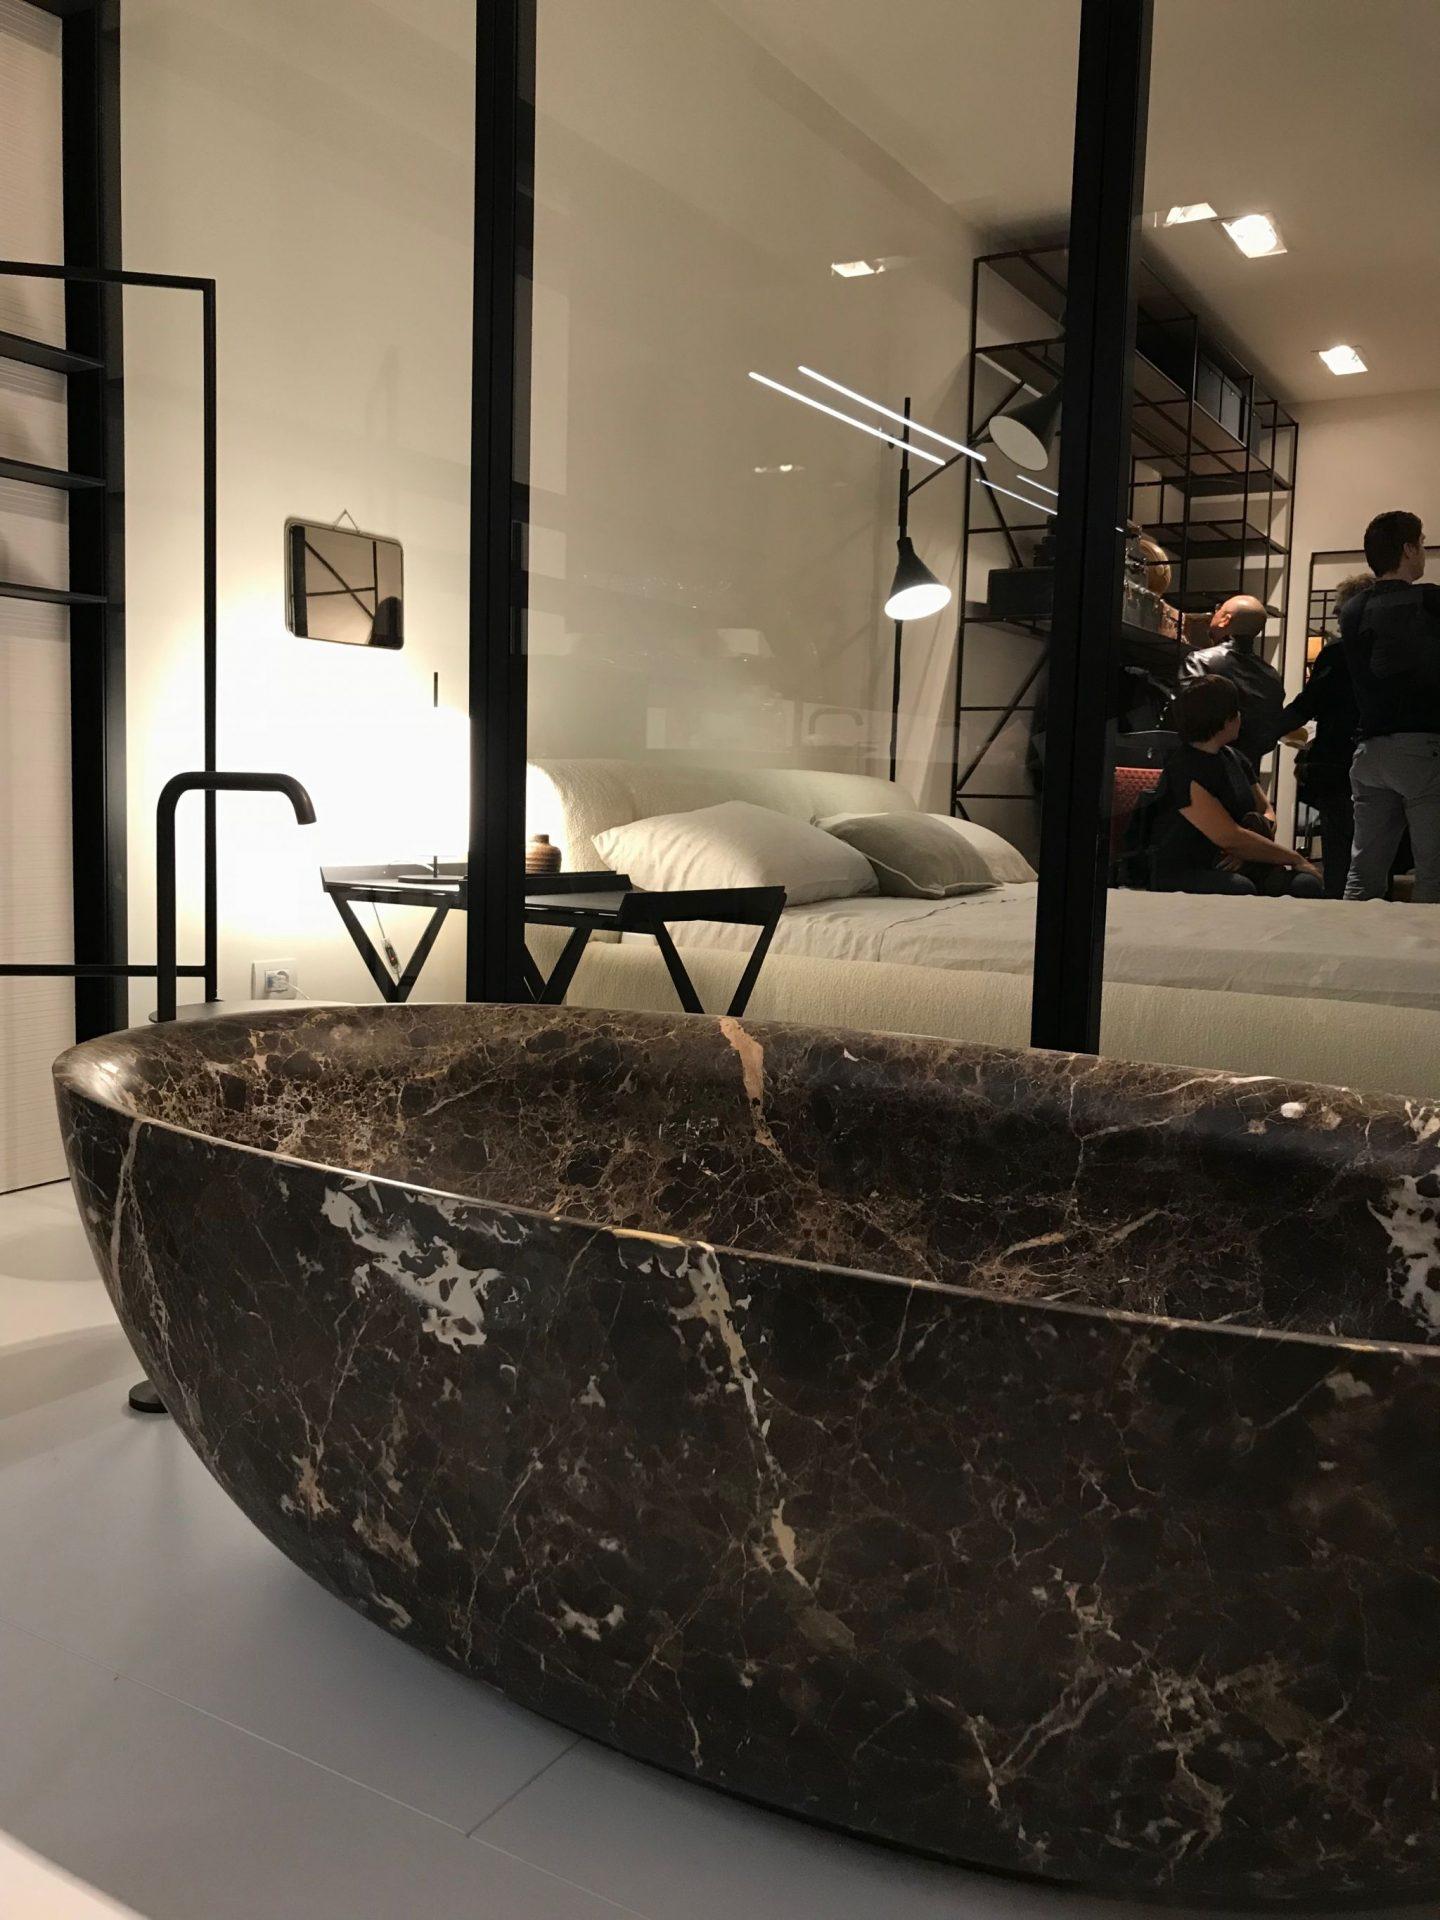 Fisher Island Bath, Boffi, highlights from Salone del Mobile 2018, via hellopeagreen, interior blogger